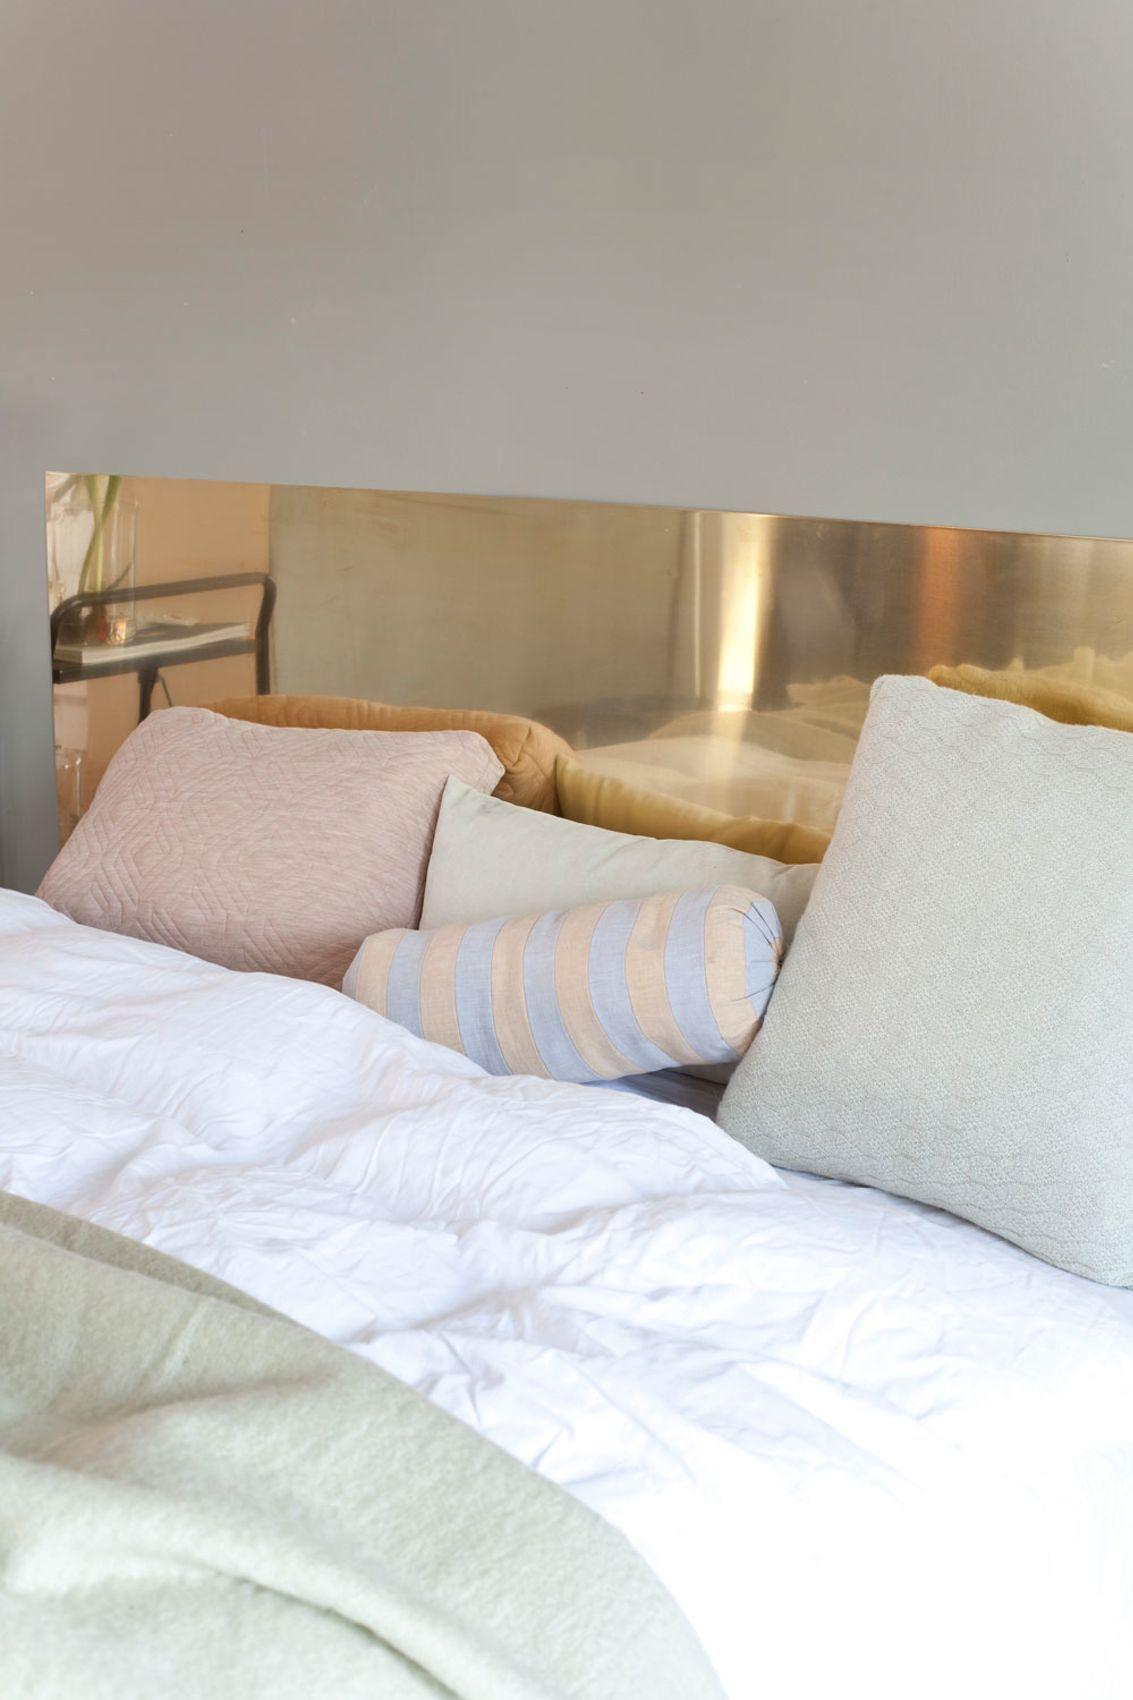 Lag din egen sengegavl! Messingplate fra Astrup, puter og pledd fra ...